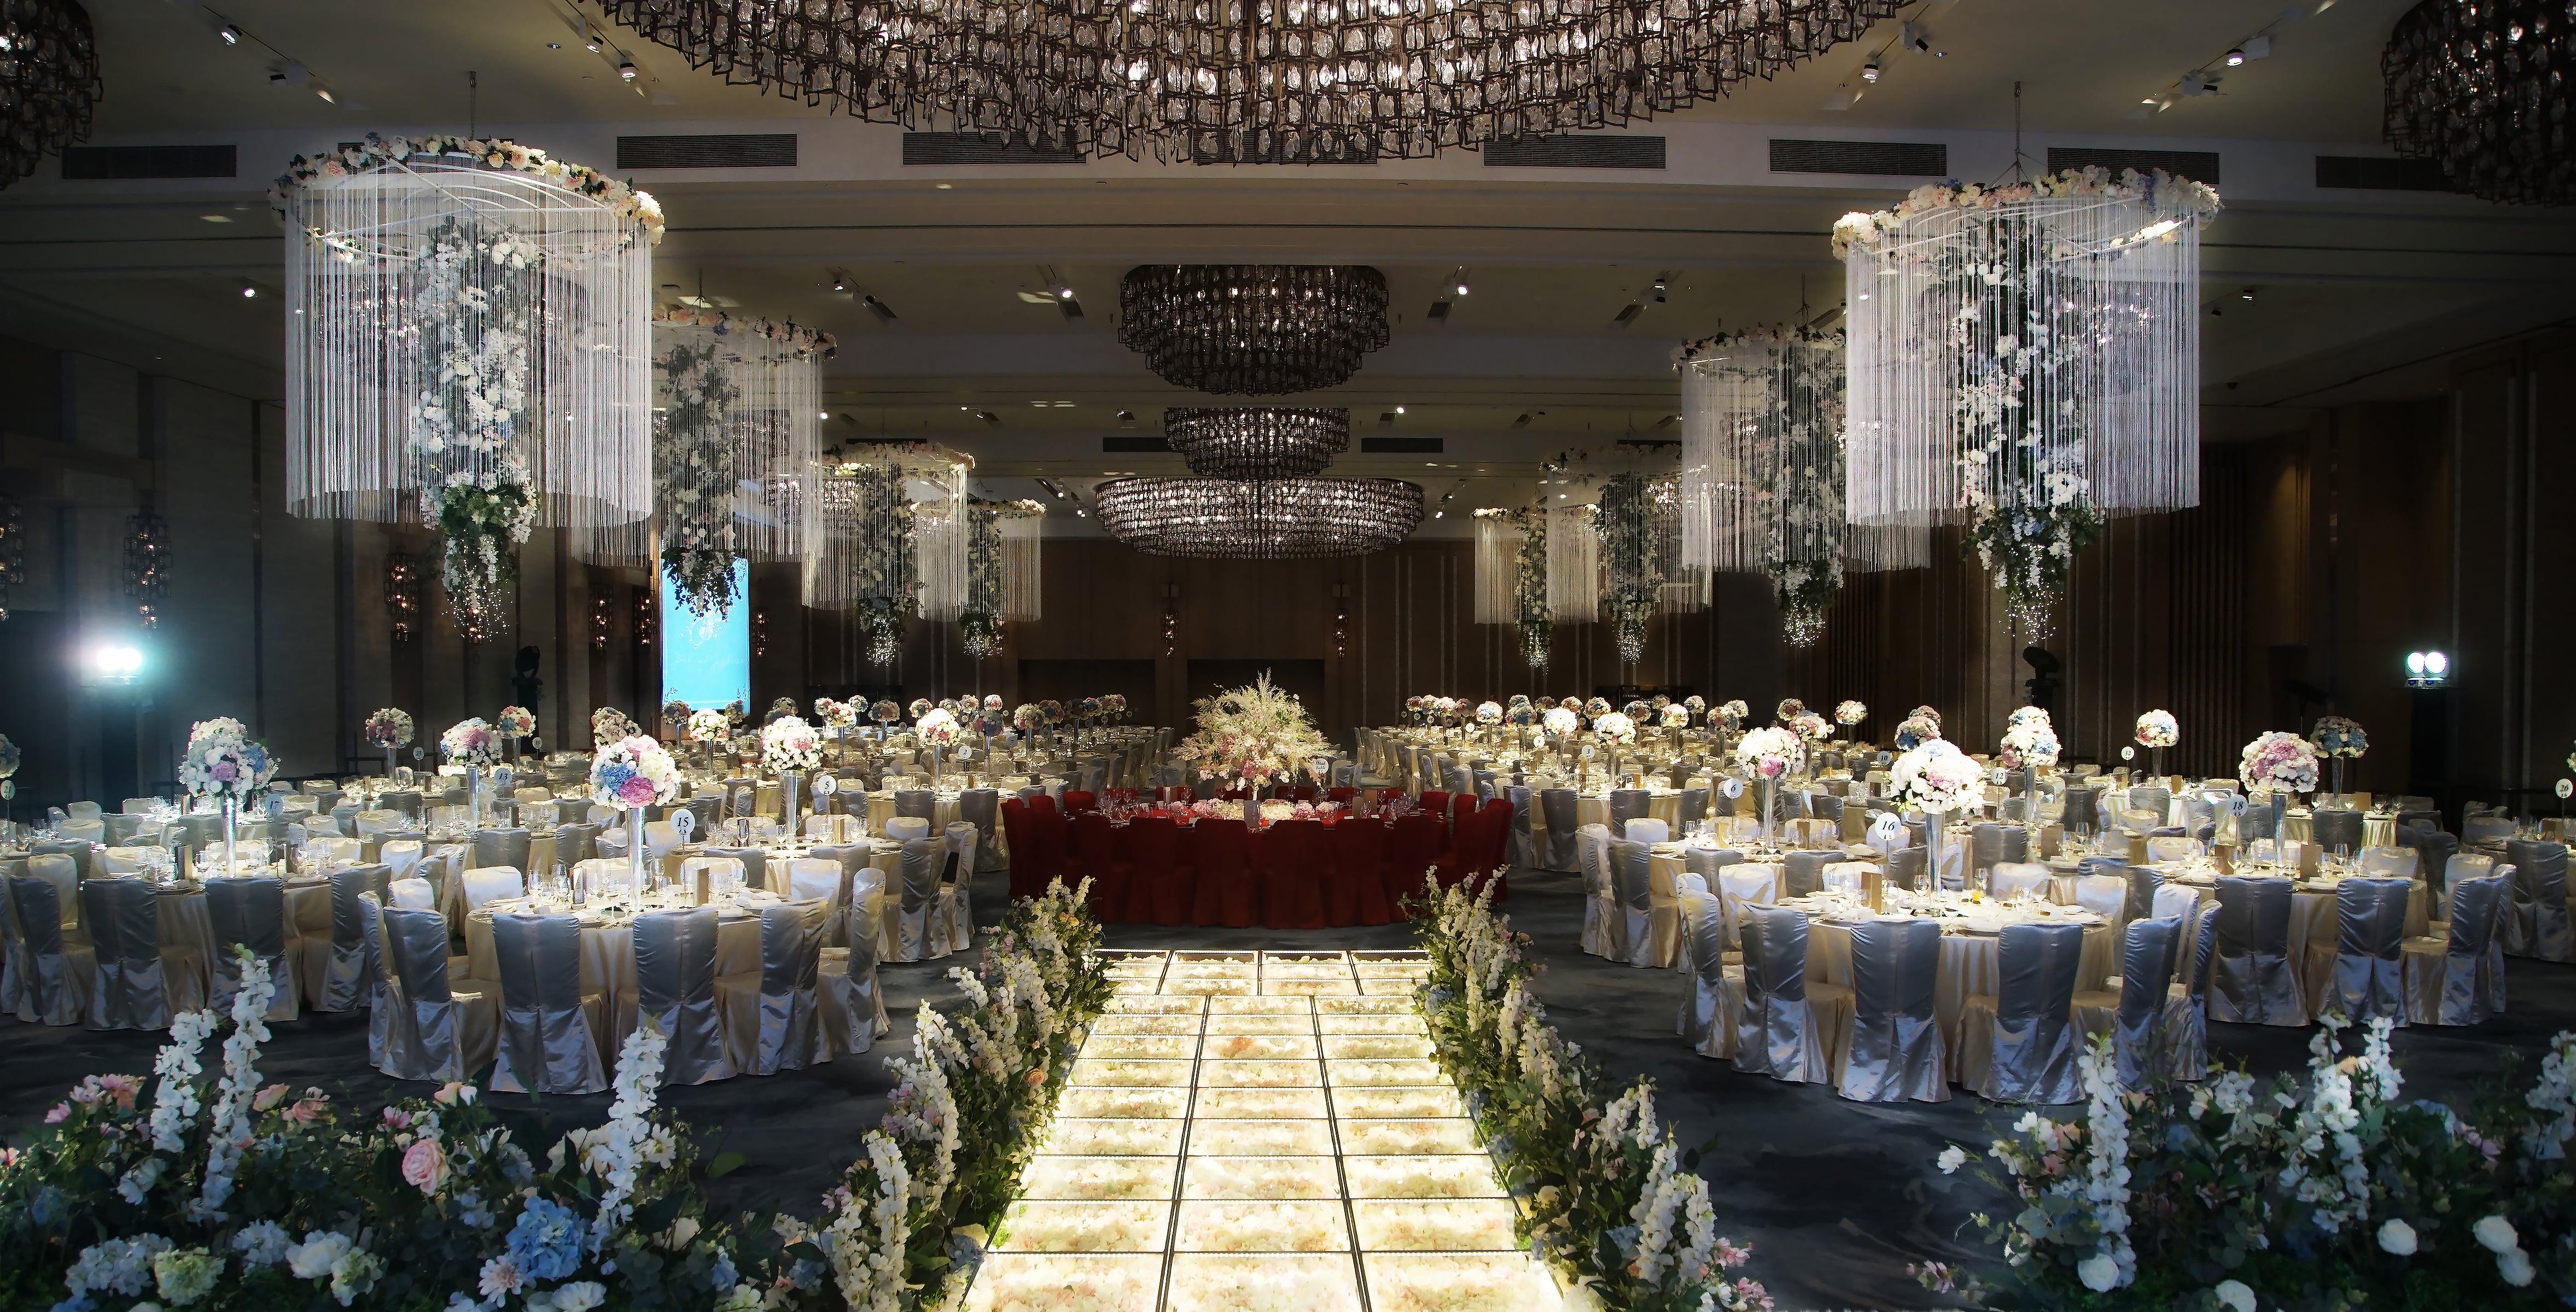 Flipboard 3 Top Wedding Decorators In Hong Kong You Should Know